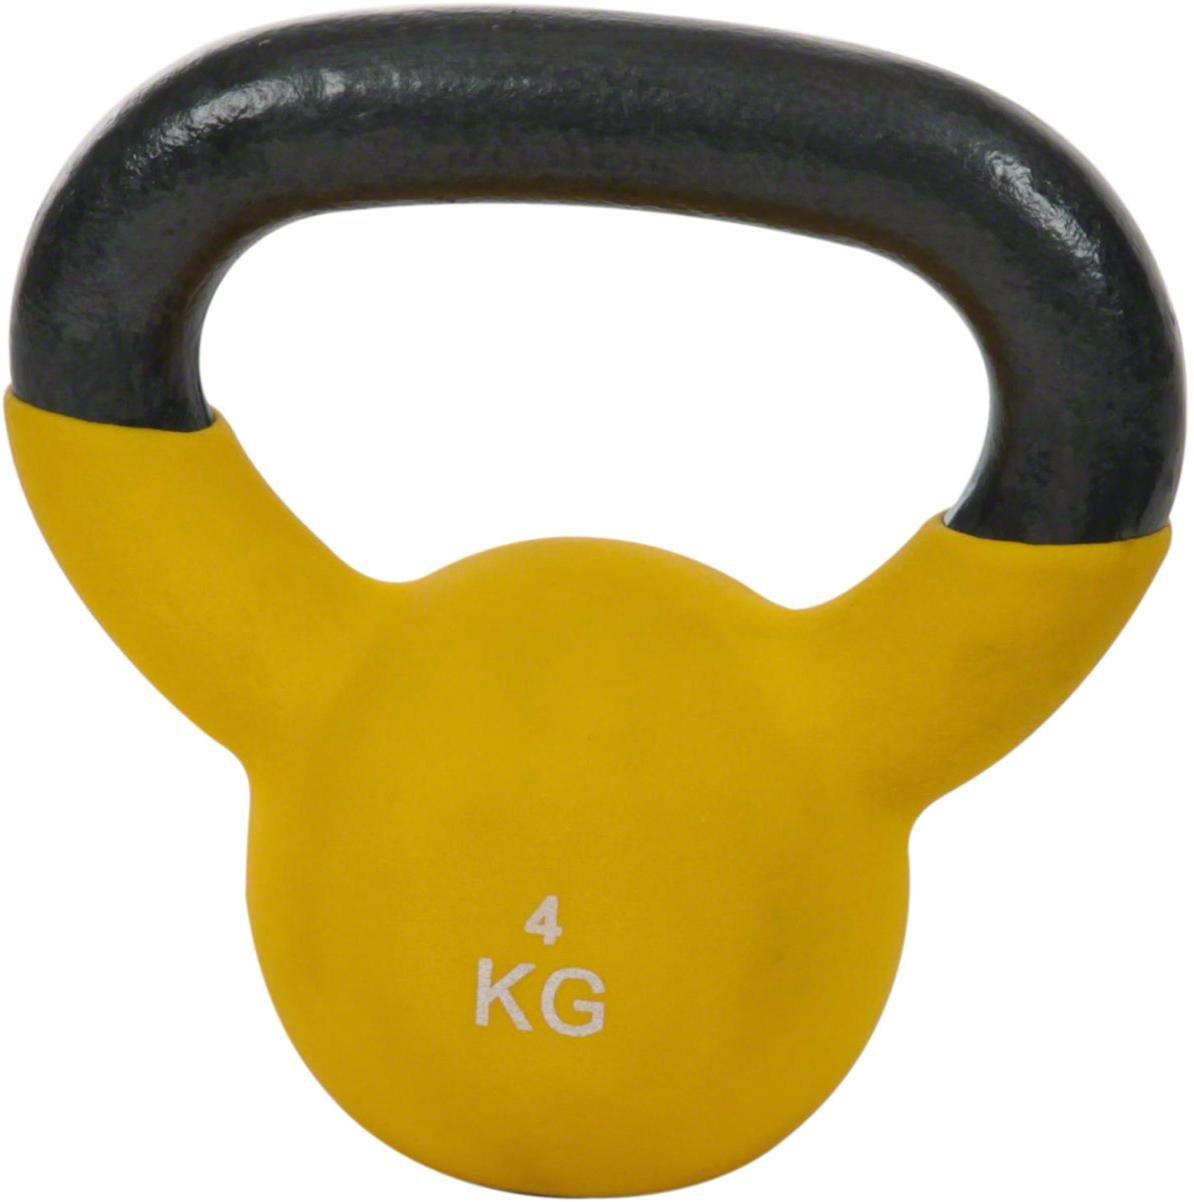 Kettlebell Kunststoff 2-20 kg Kugelhantel bodenschonende Schwunghantel